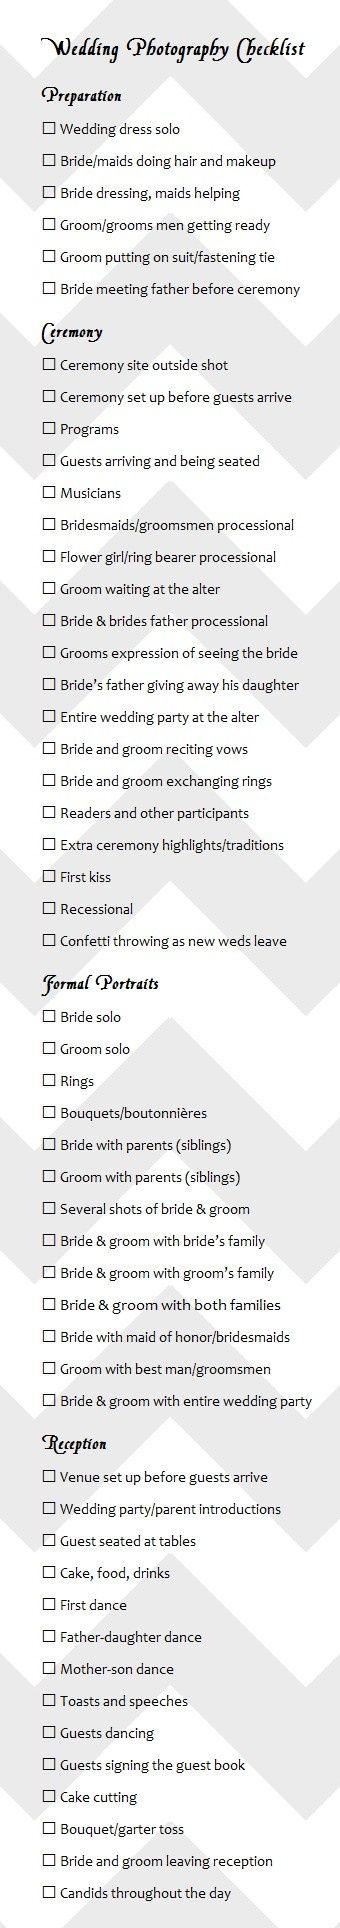 wedding photography checklist best photos - wedding photography  - cuteweddingideas.com